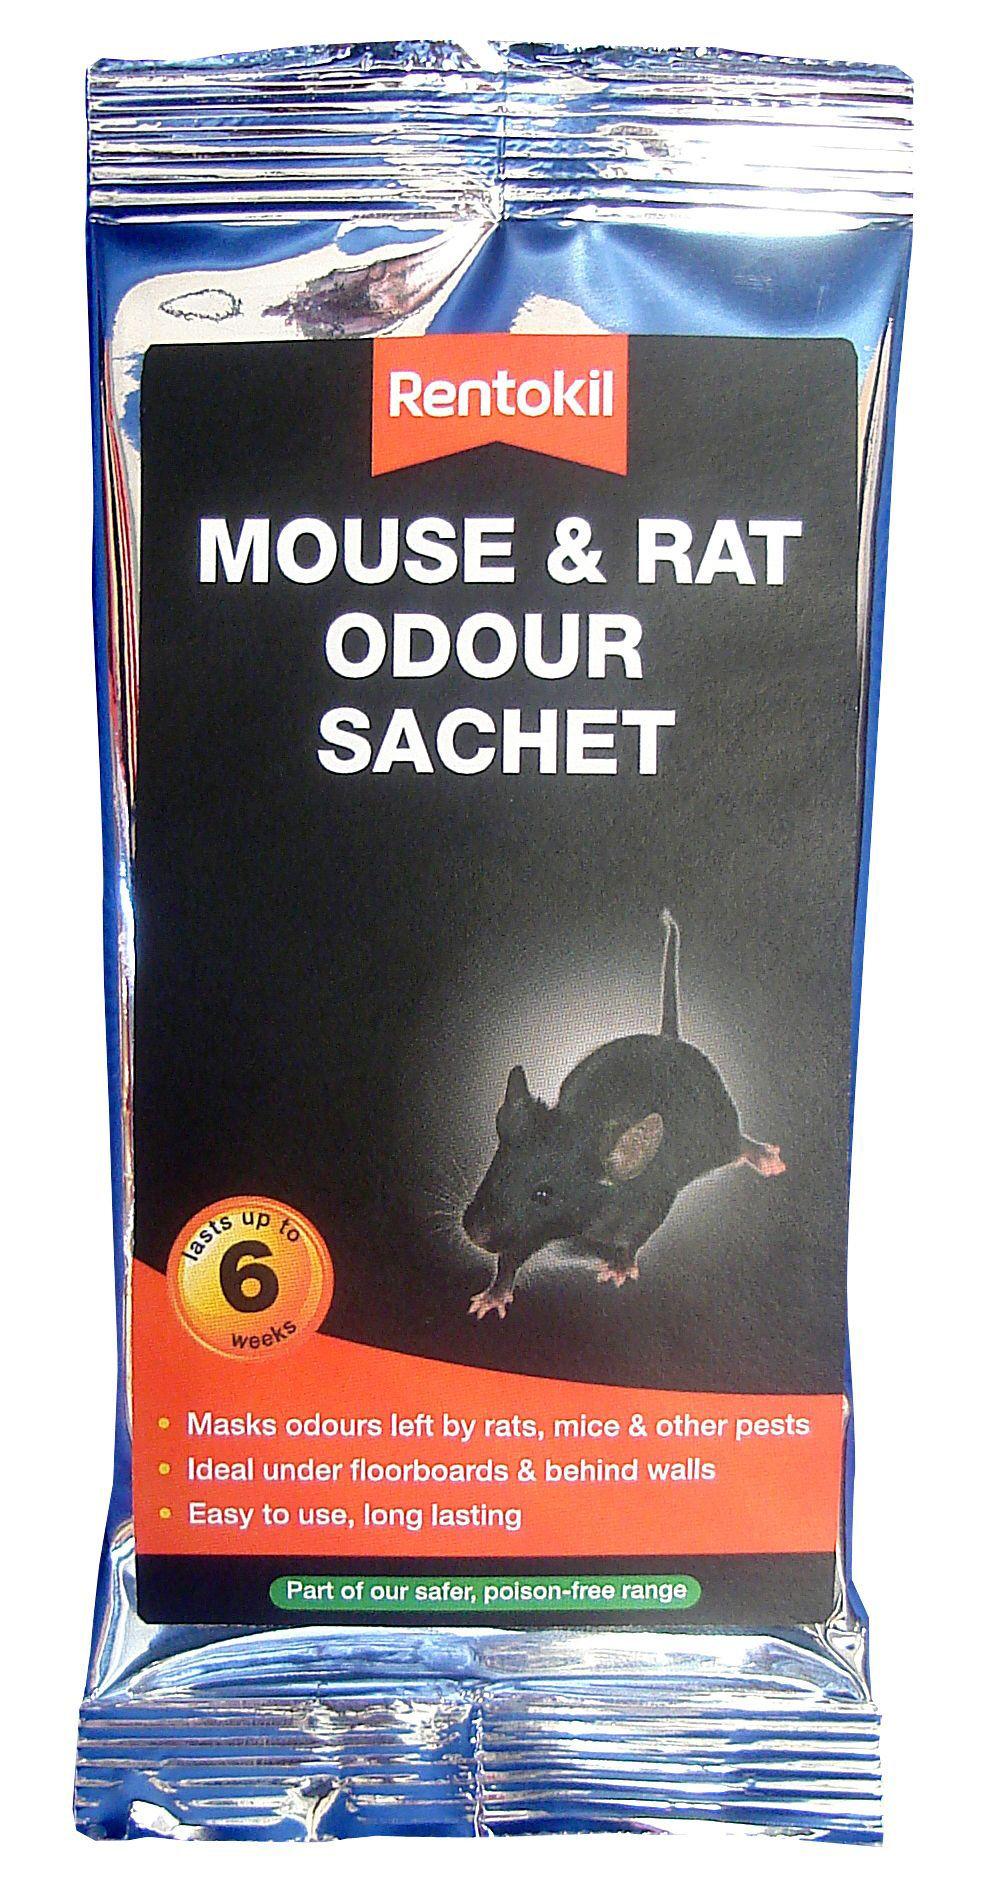 Rentokil Mouse /& Rat Odour Sachet.